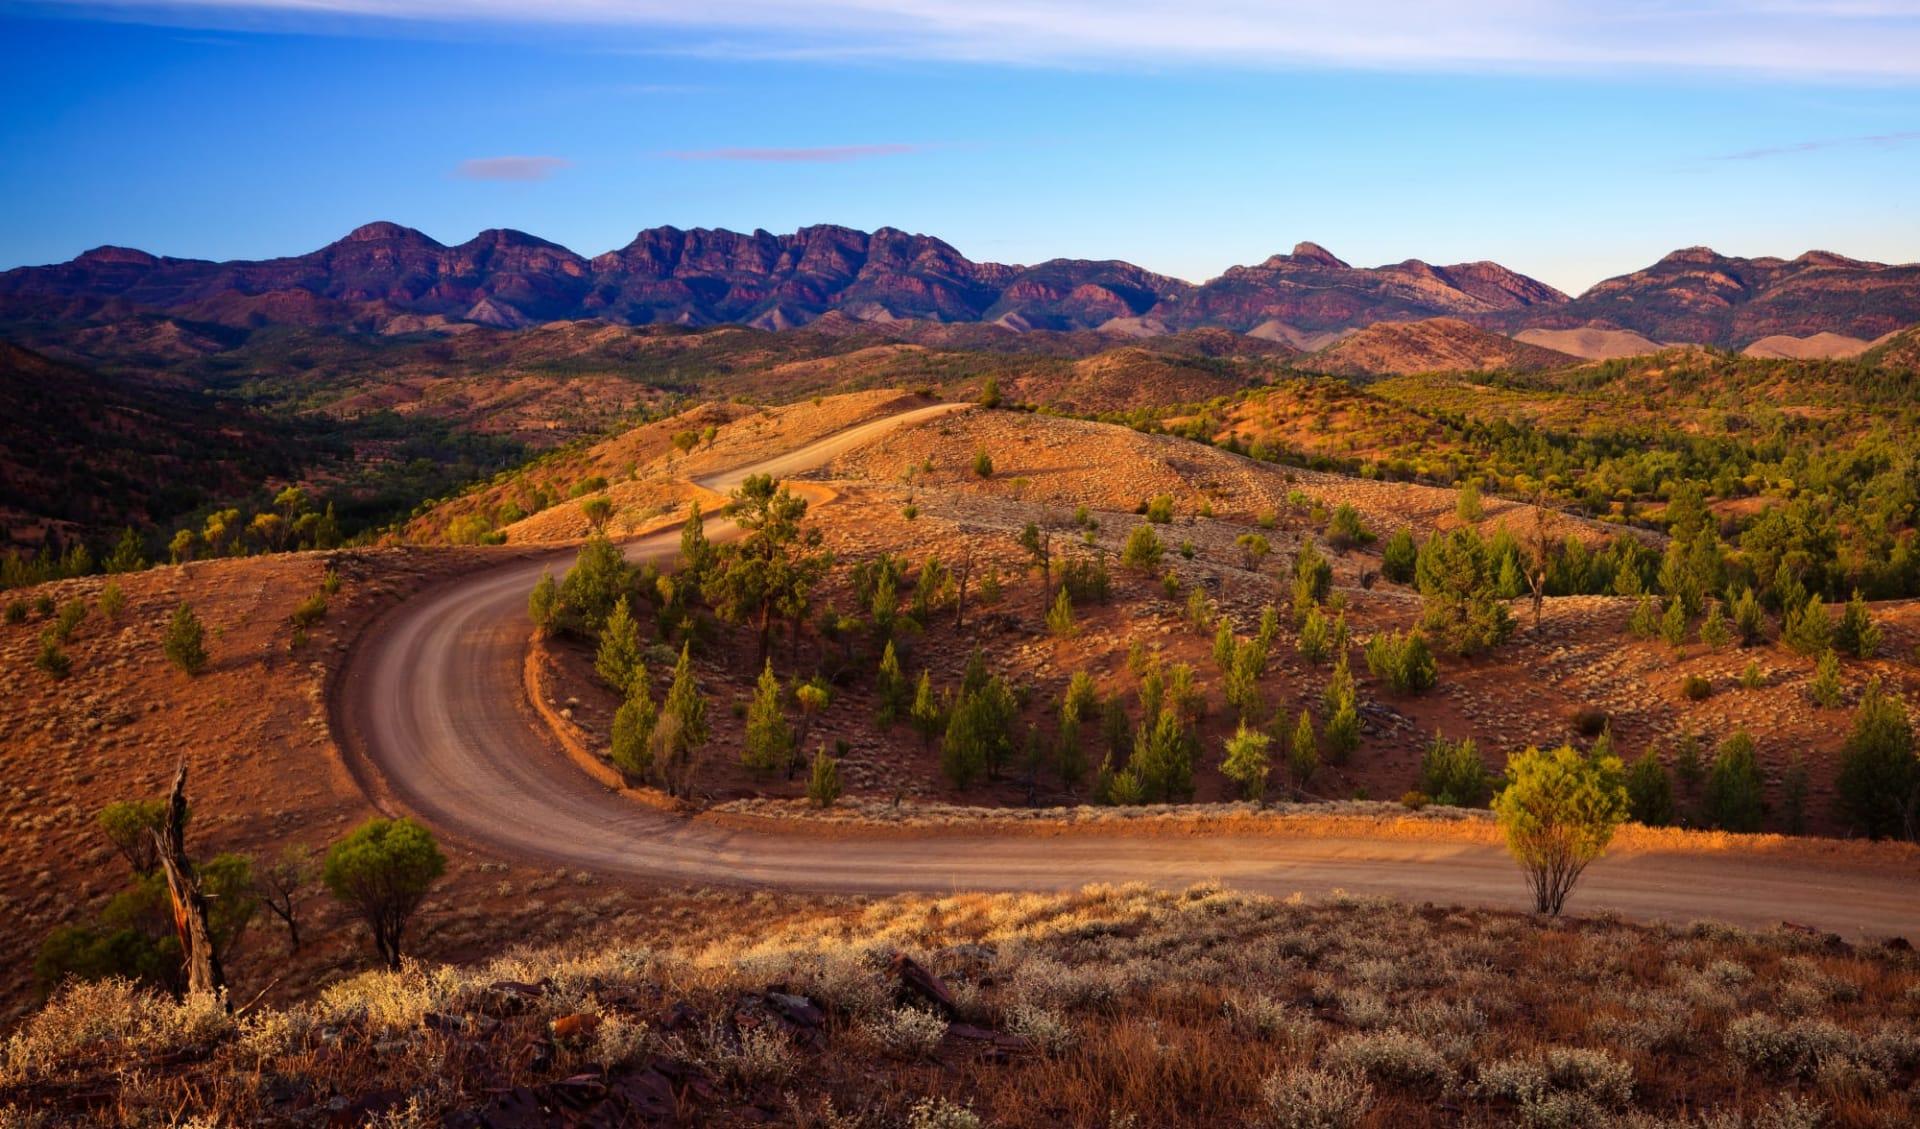 Melbourne to Darwin: Durch das Bunyeroo-Tal im Flinders Ranges National Park